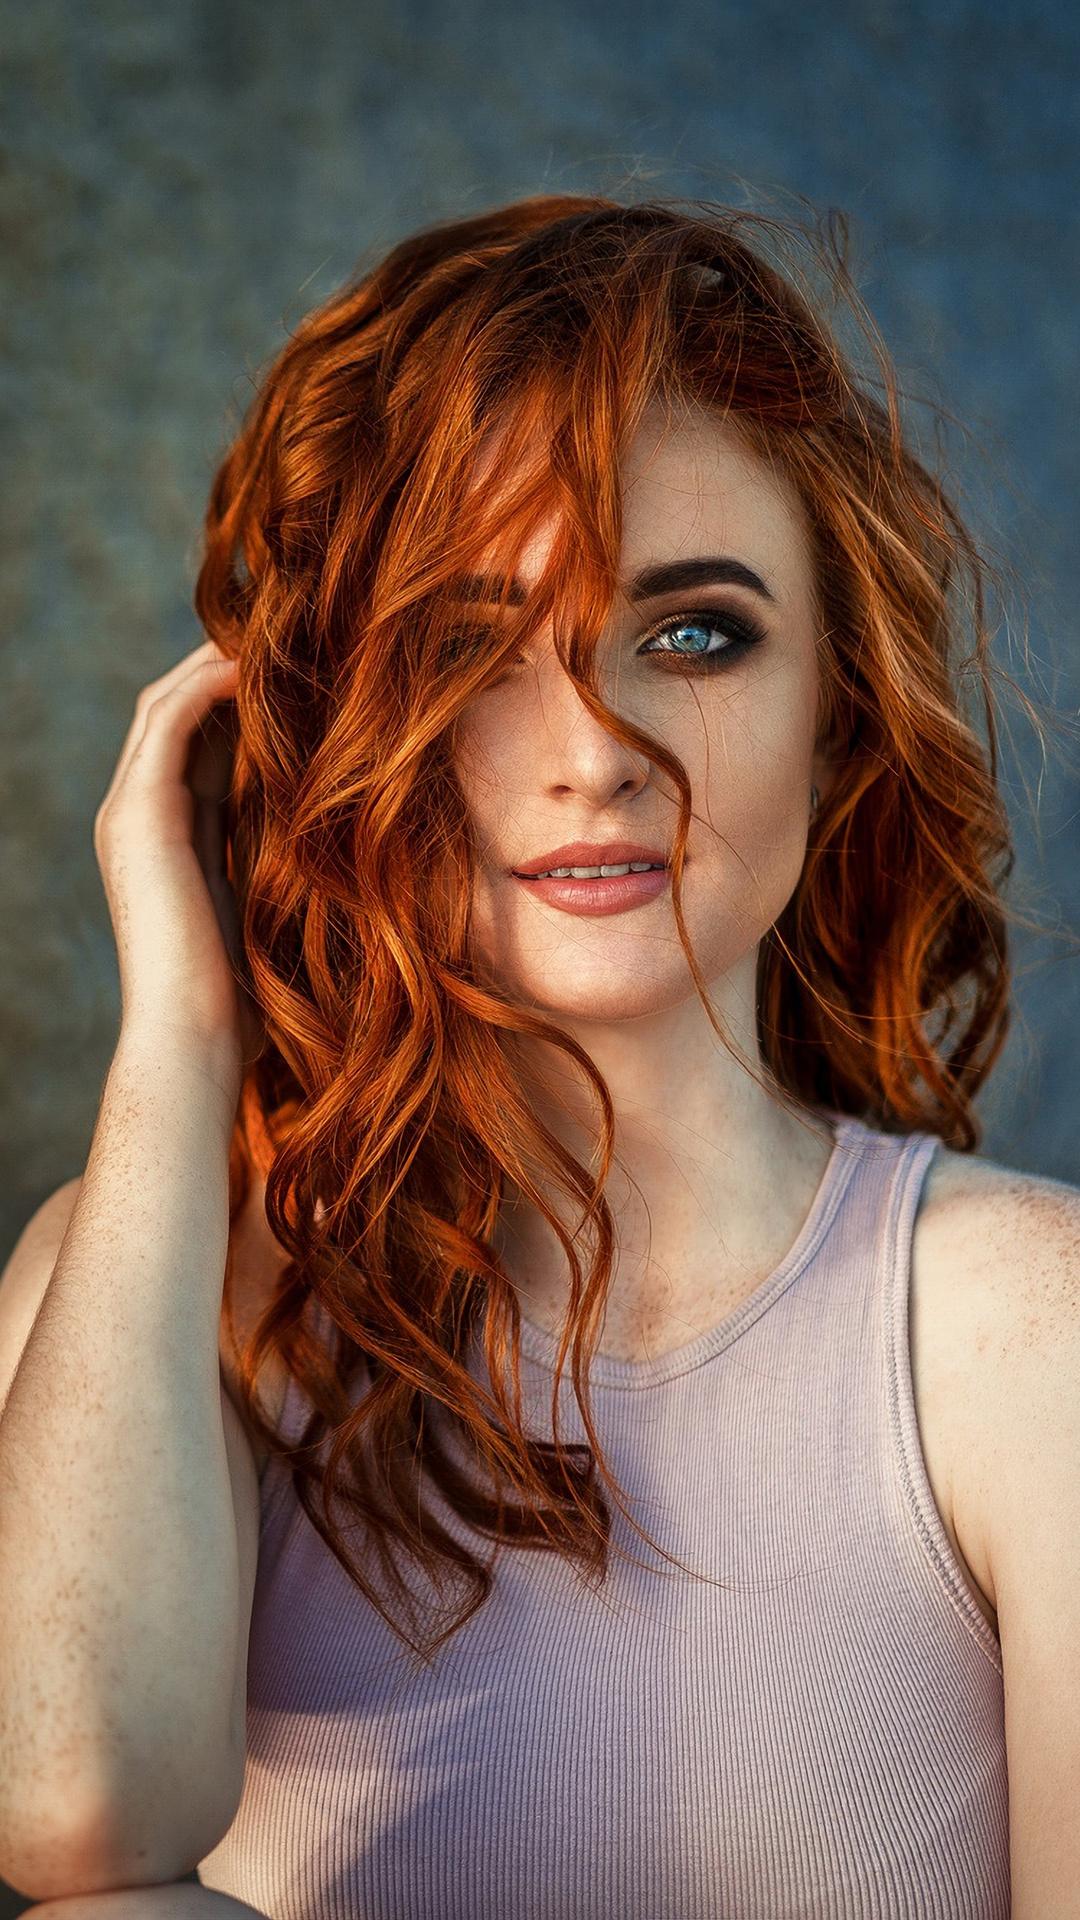 red-head-beautiful-girl-4k-fu.jpg